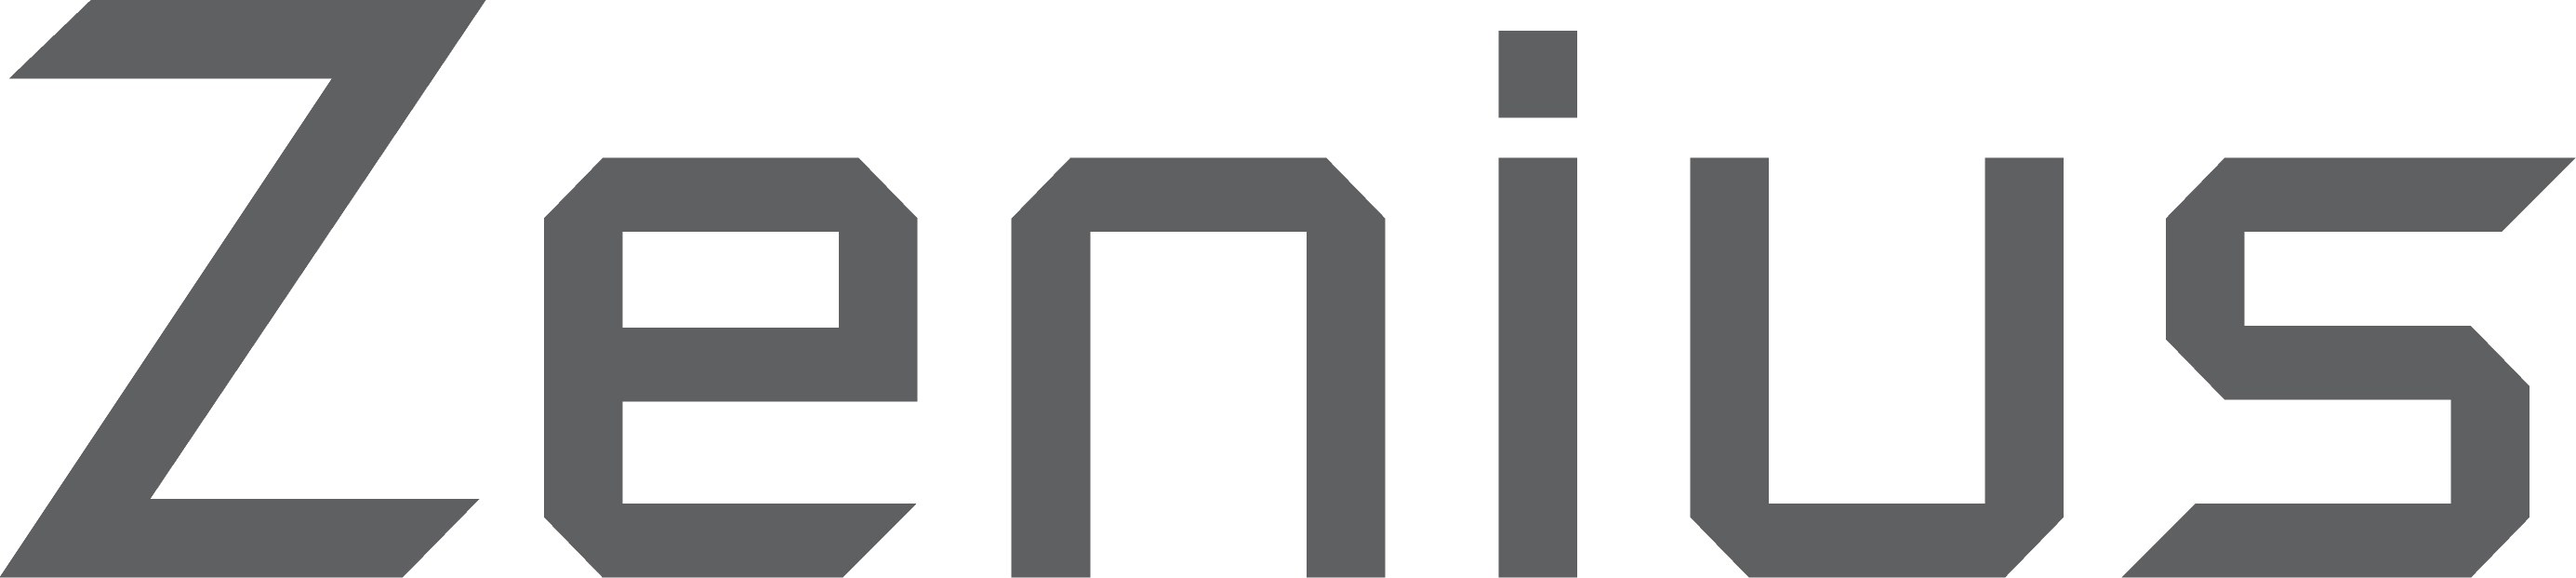 Evolis zenius plastic card printer and supplies practical card zenius logo stopboris Choice Image